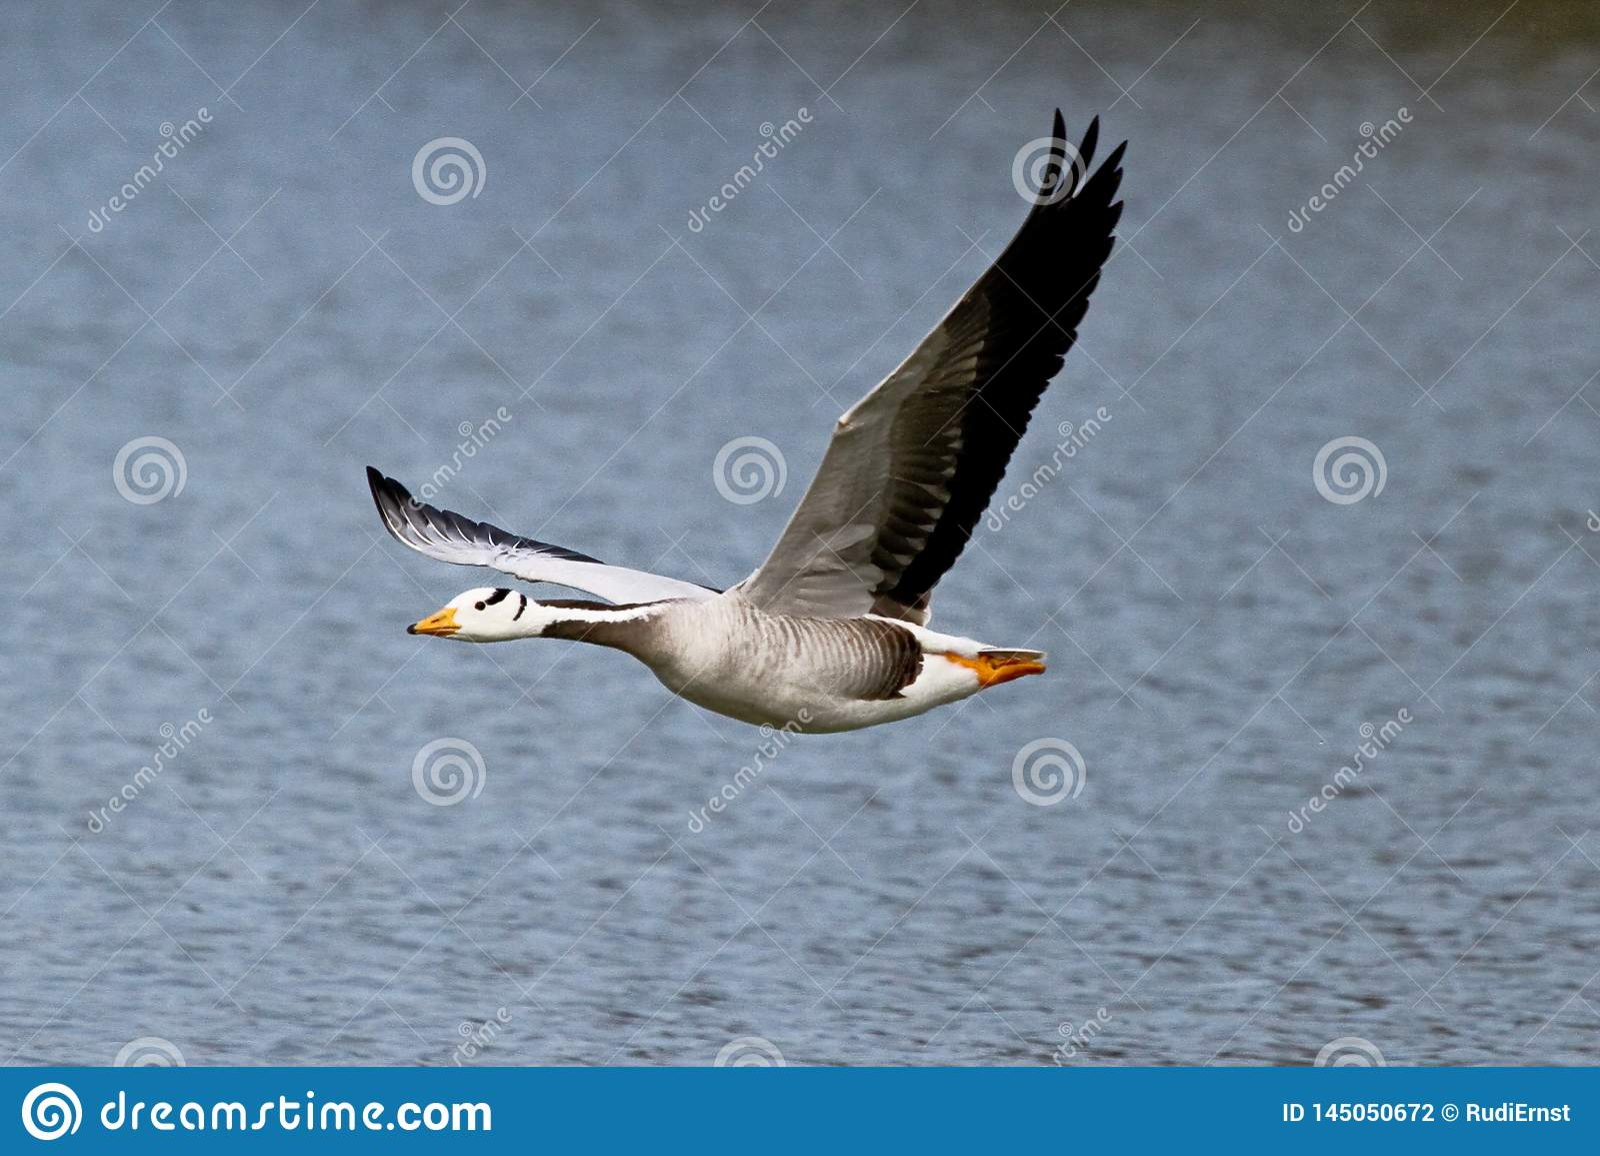 The Bar Headed Goose Anser Indicus Seen In English Garden In Munich